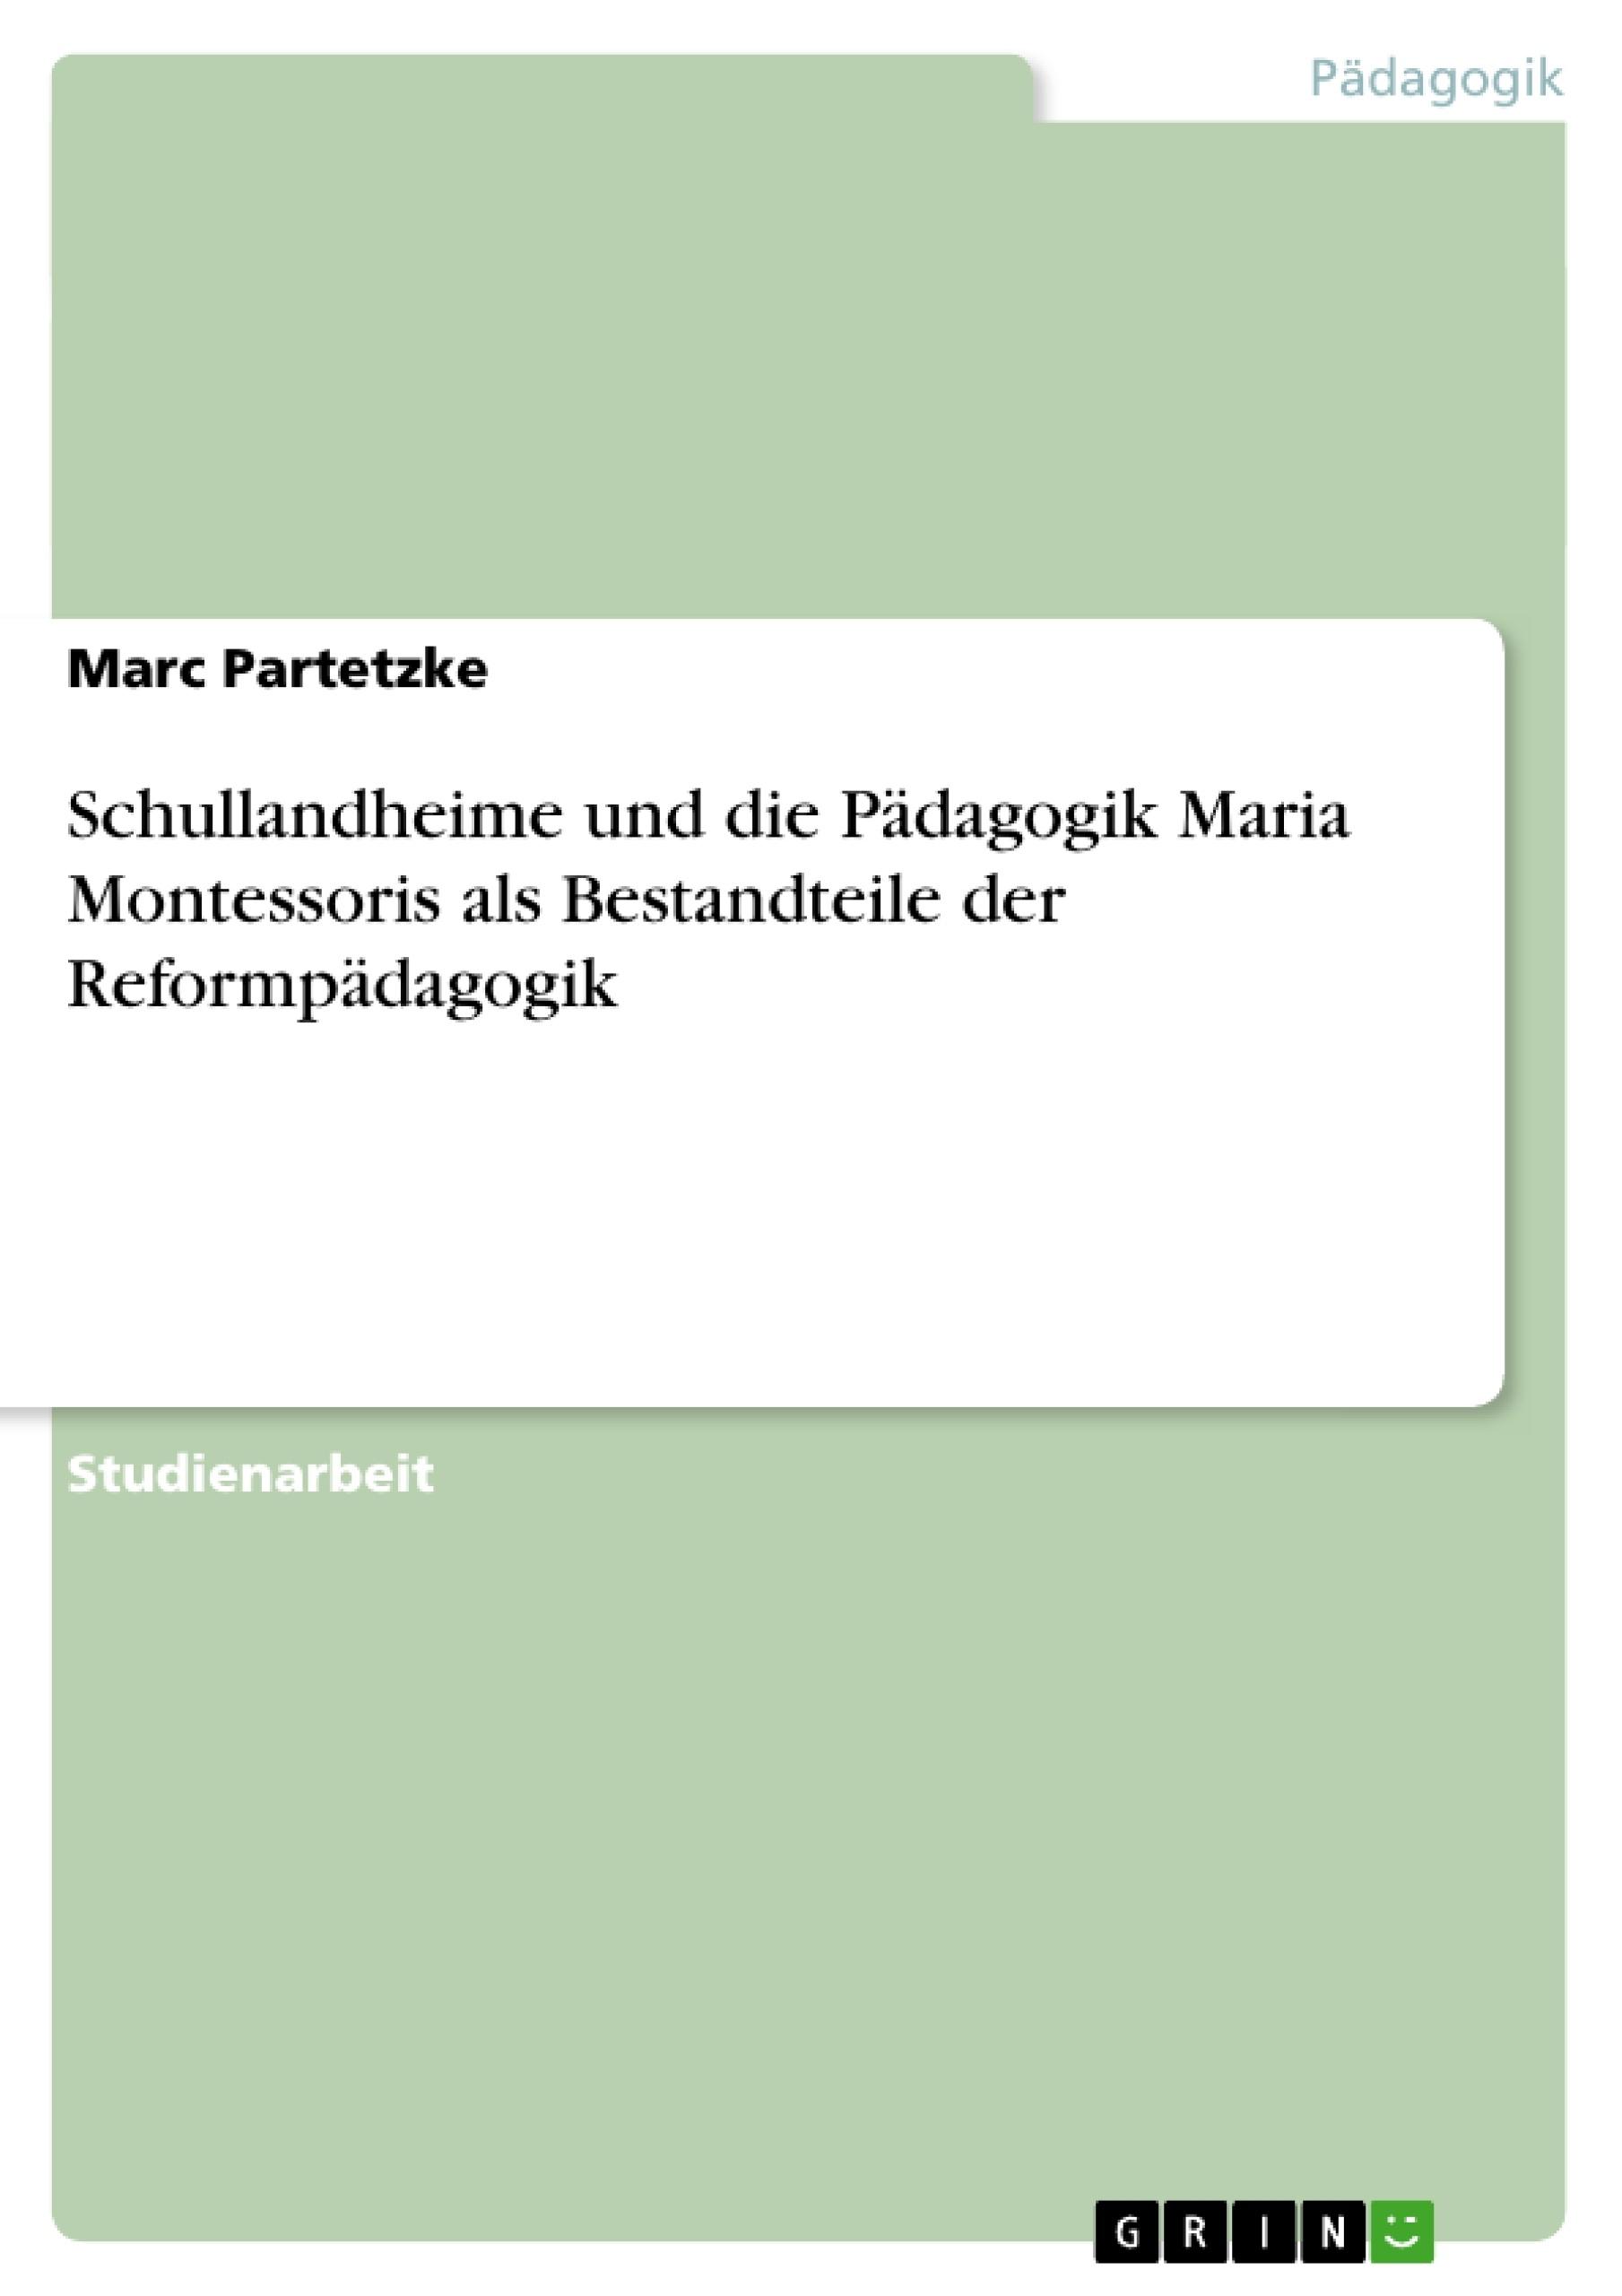 essay on maria montessori Montessori curriculum essays examine the educational philosophy developed by italian educator maria montessori that emphasizes on a child's independence.